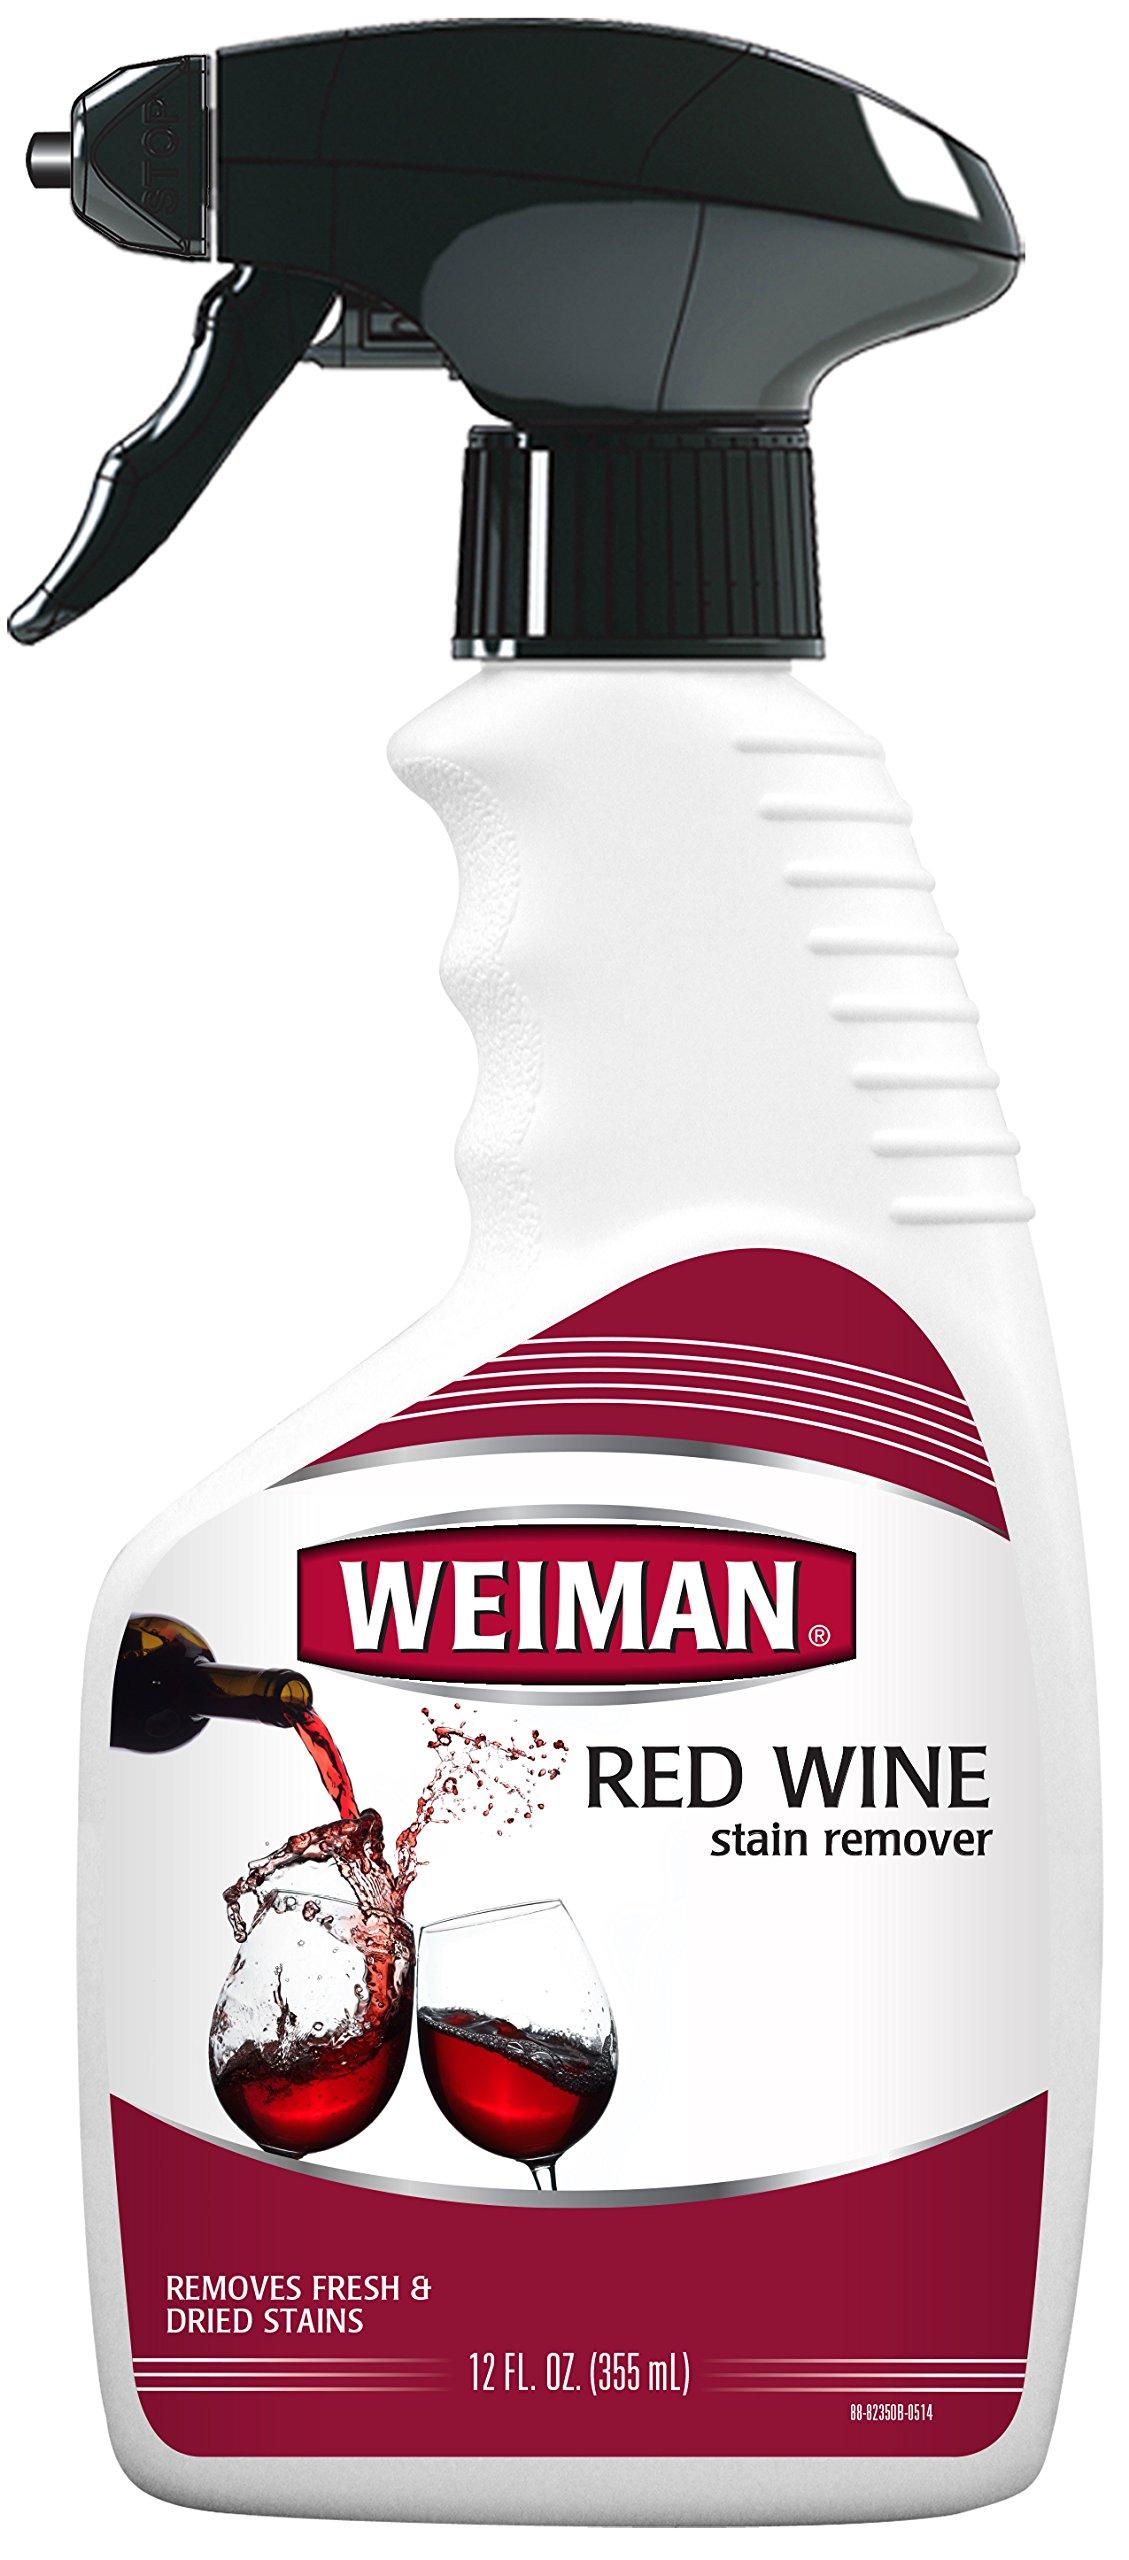 Weiman Red Wine Stain Remover, 12 fl. oz.